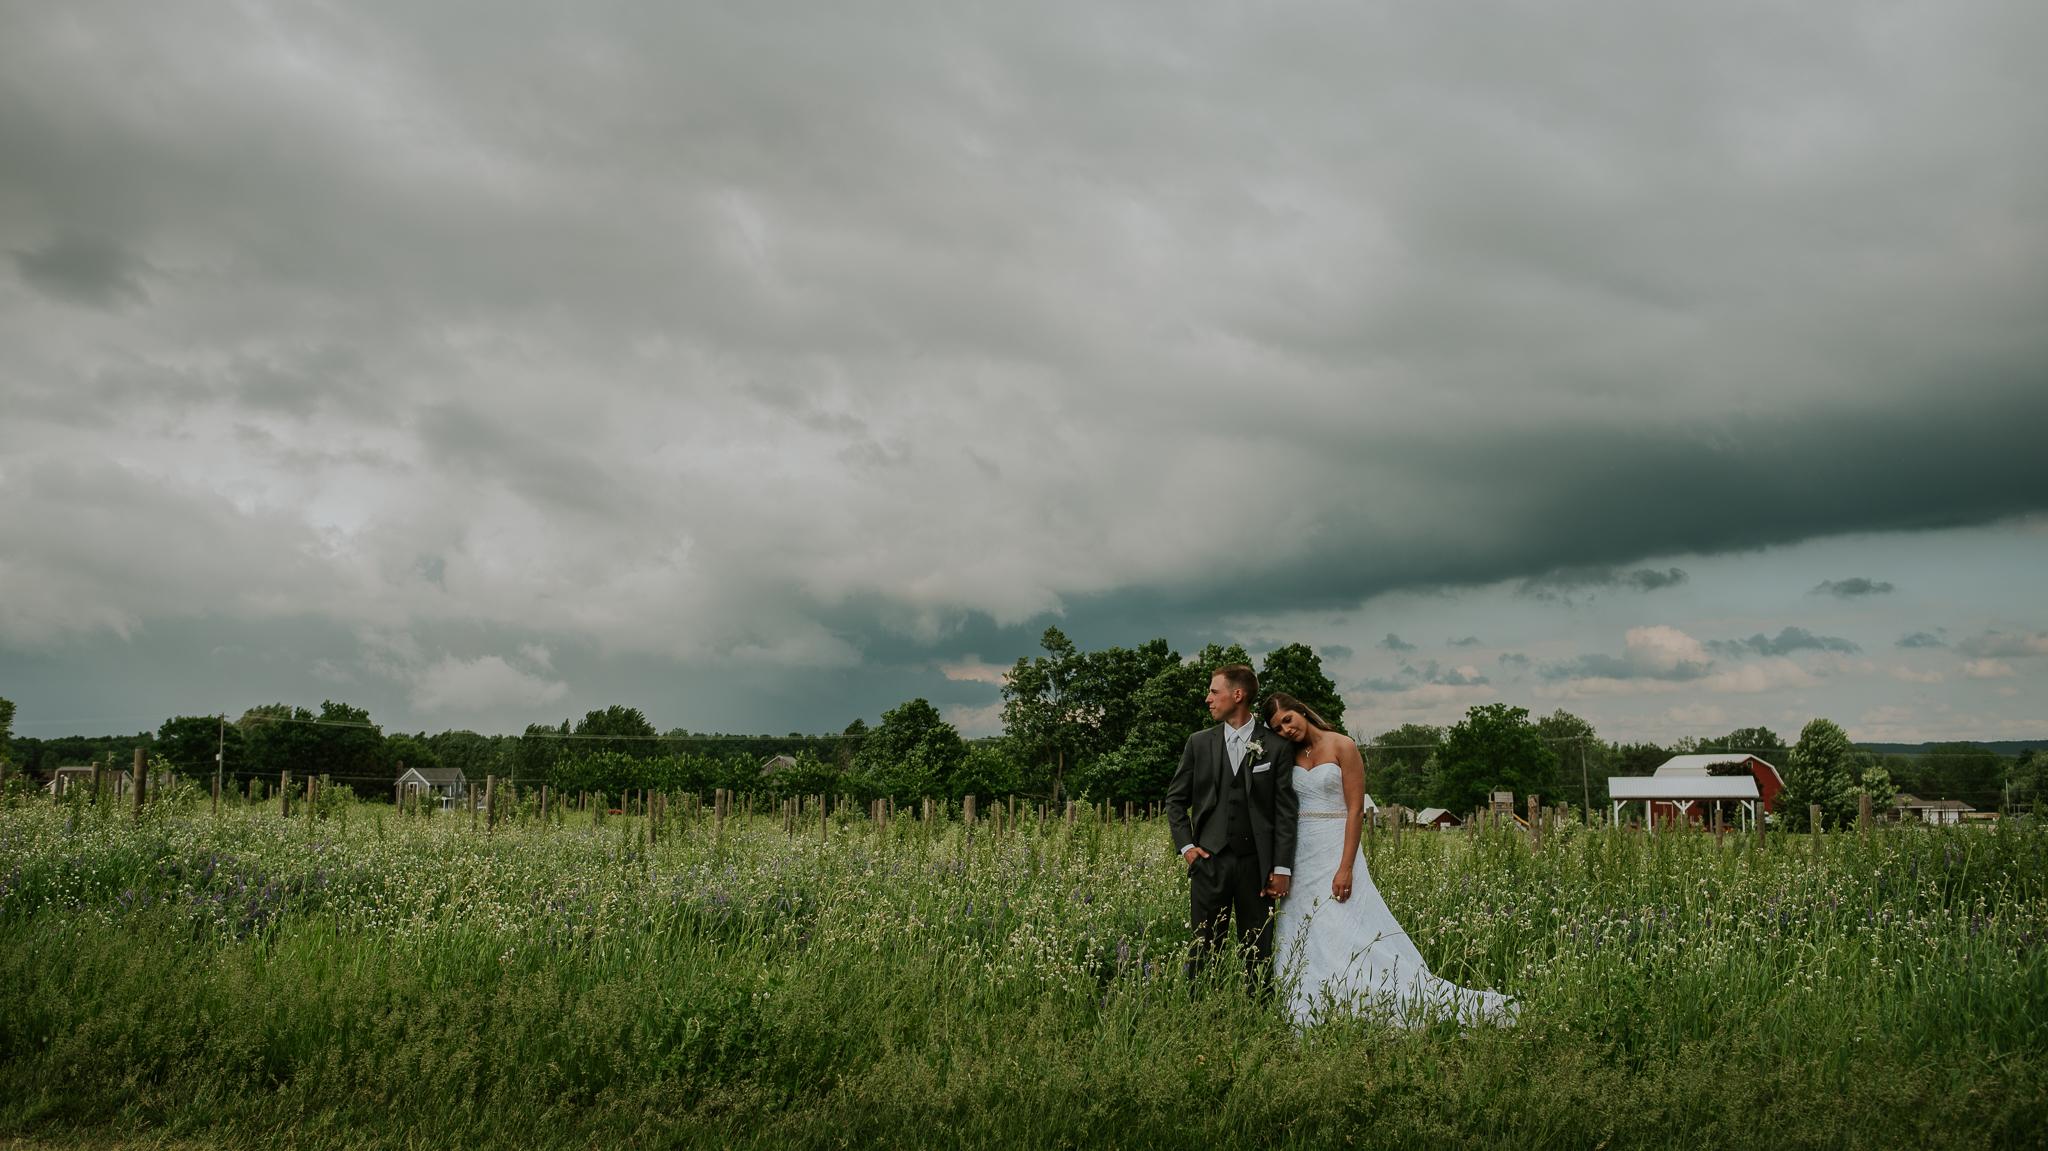 Birchview Outdoor Wedding and Event Center | Linden, MI | Miss Lyss Photography | www.misslyssphotography.com